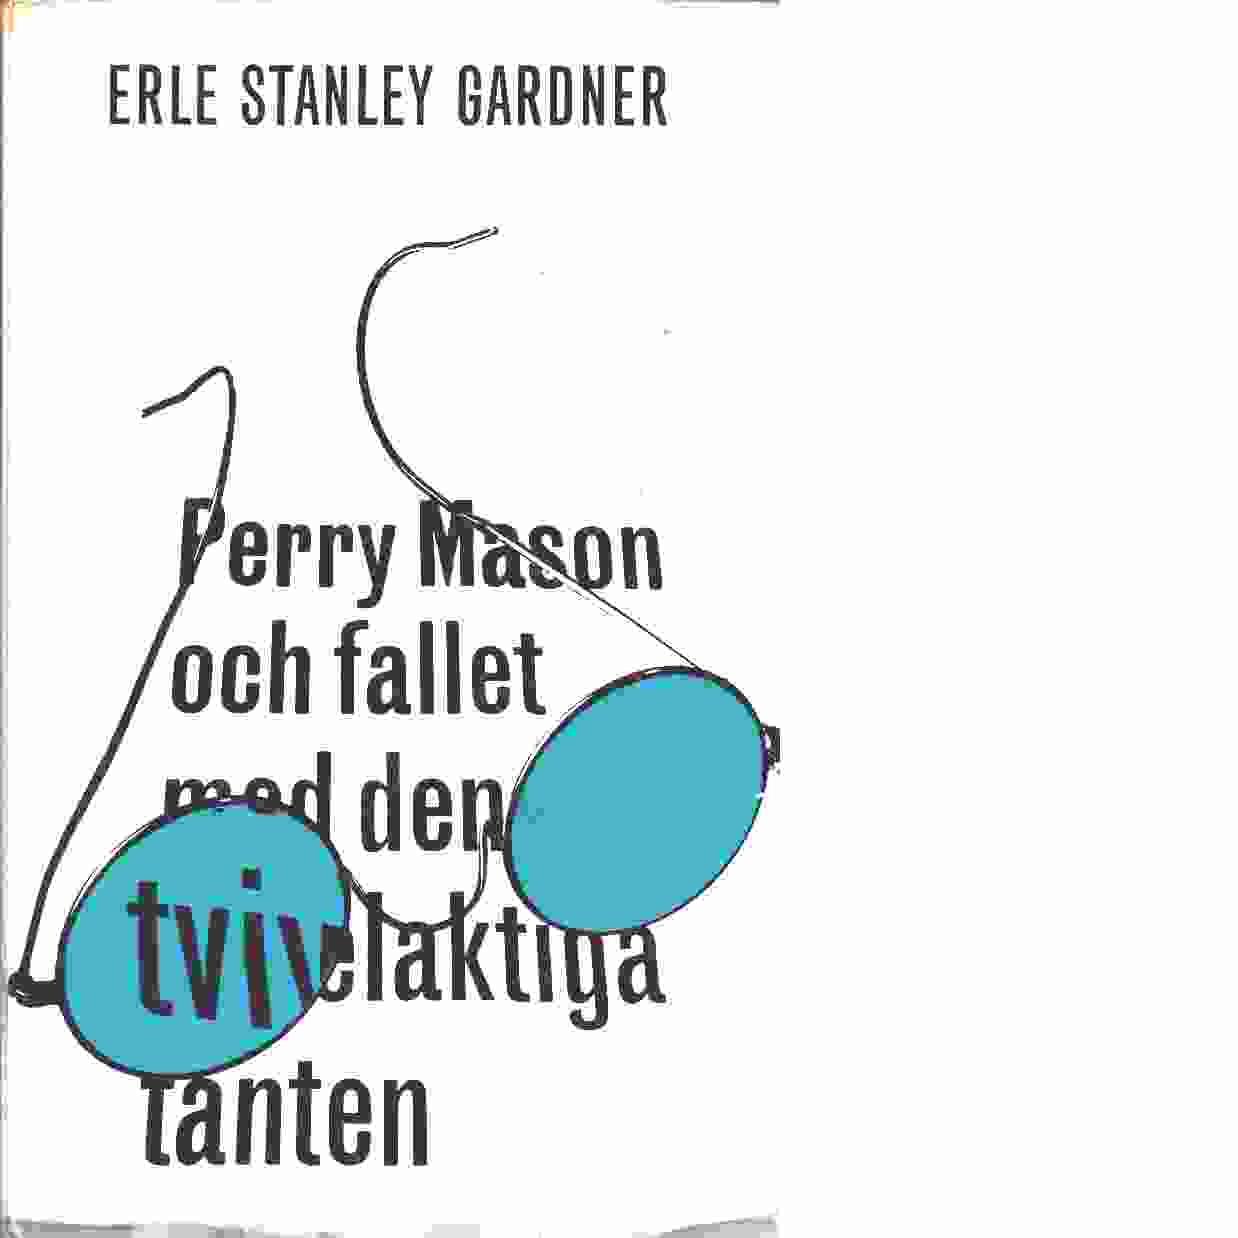 Perry Mason och fallet med den tvivelaktiga tanten - Gardner, Erle Stanley